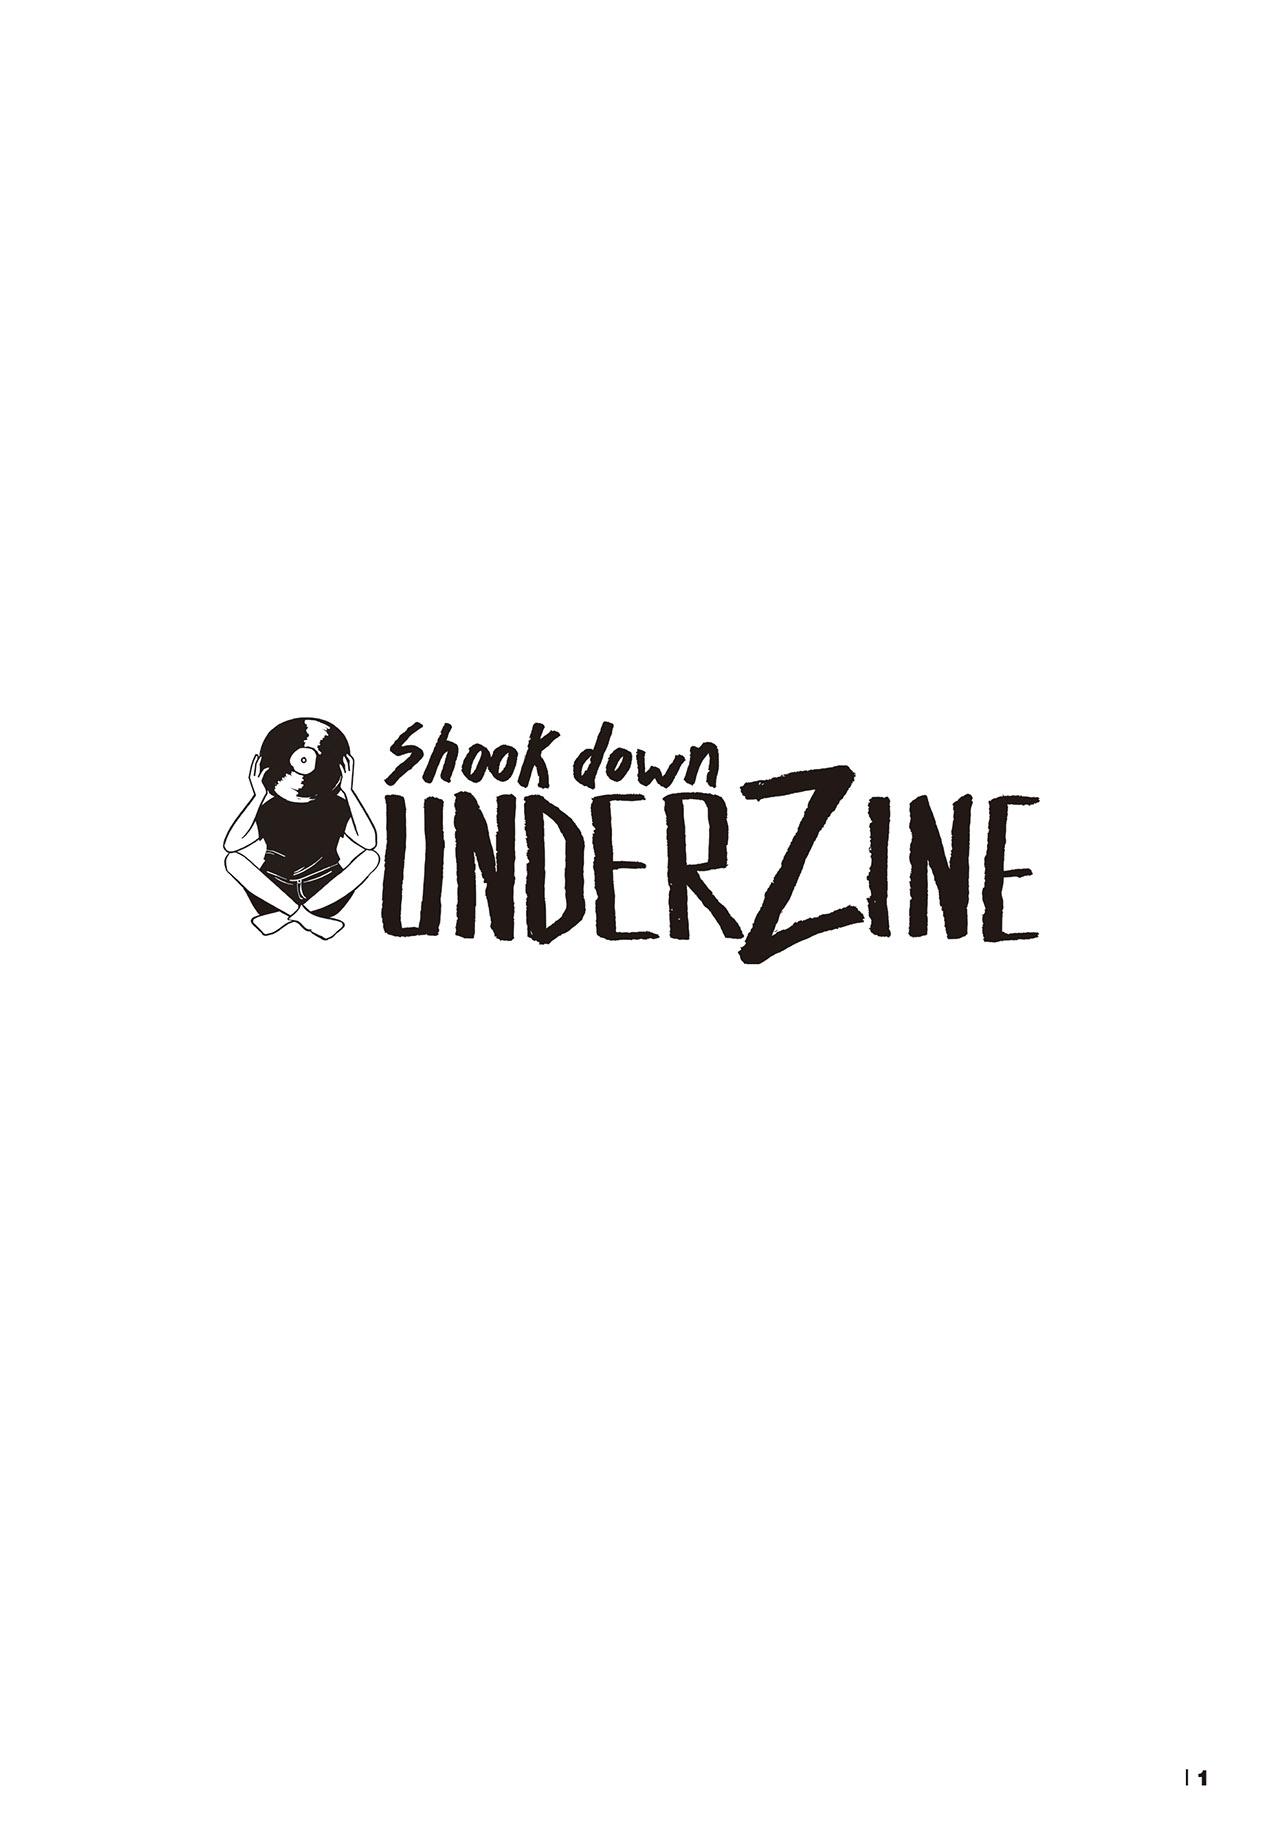 Underzine 5